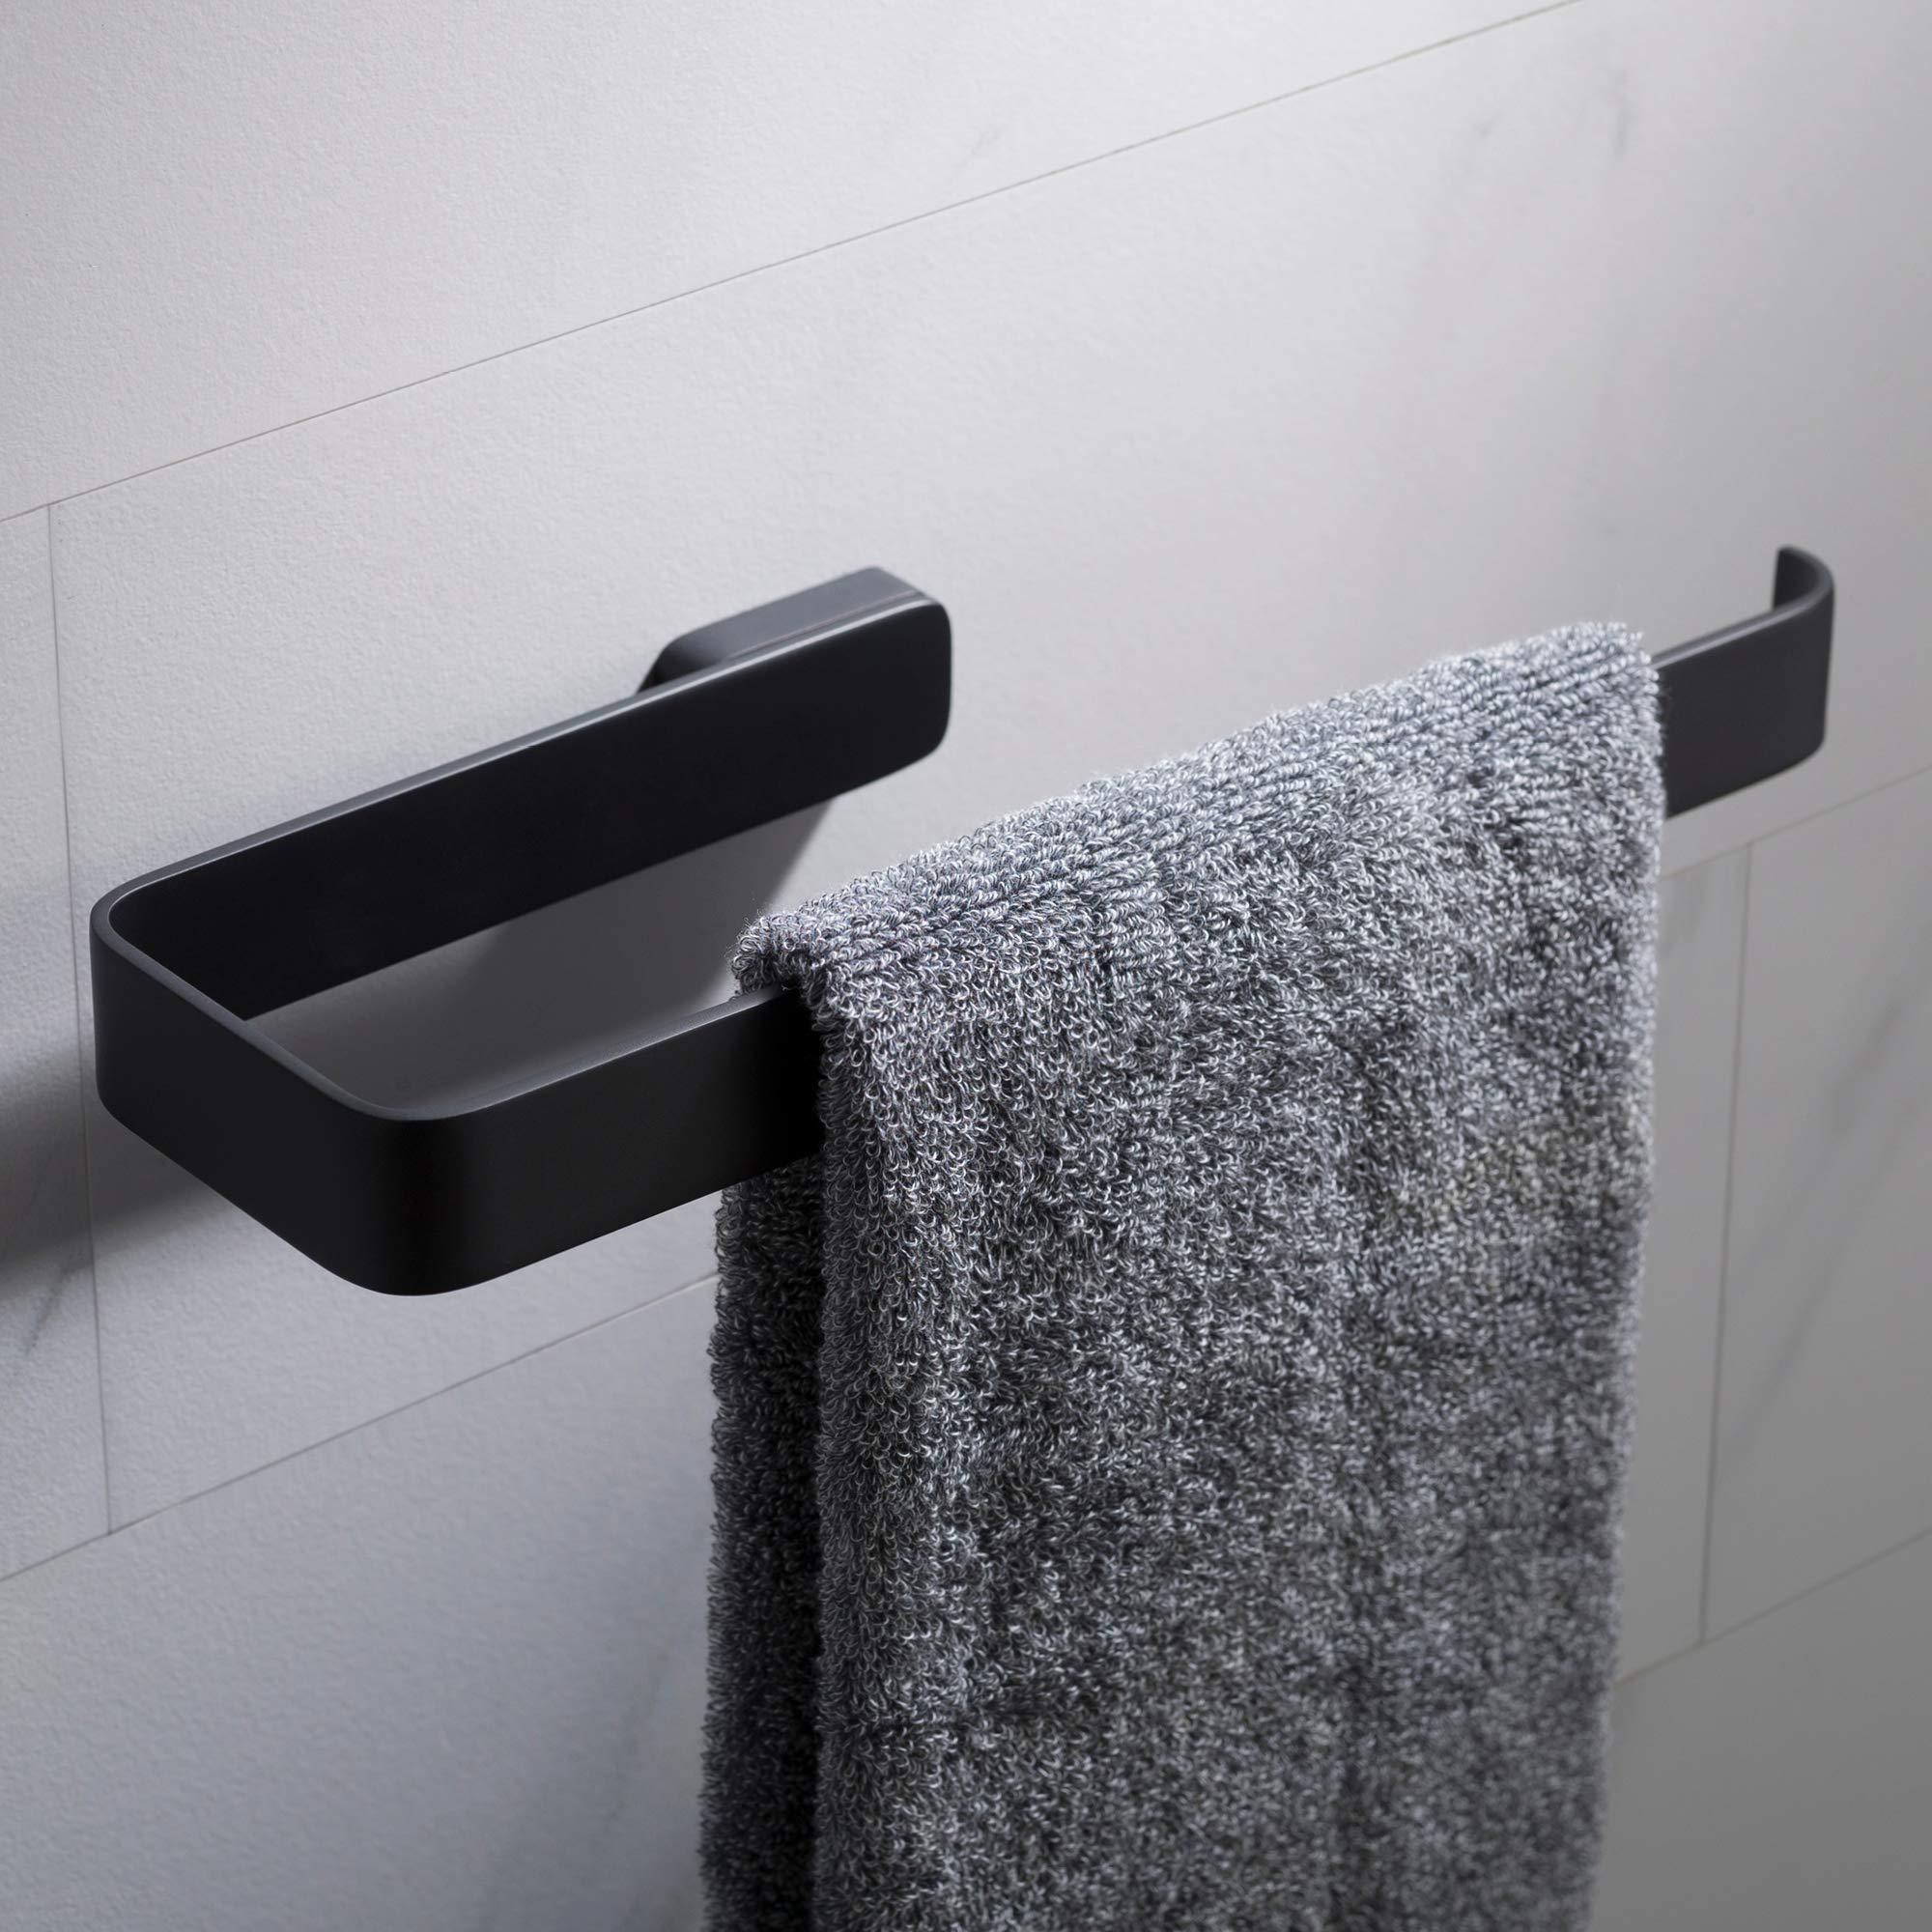 KRAUS Stelios Bathroom Towel Ring, Matte Black Finish, KEA-19925MB